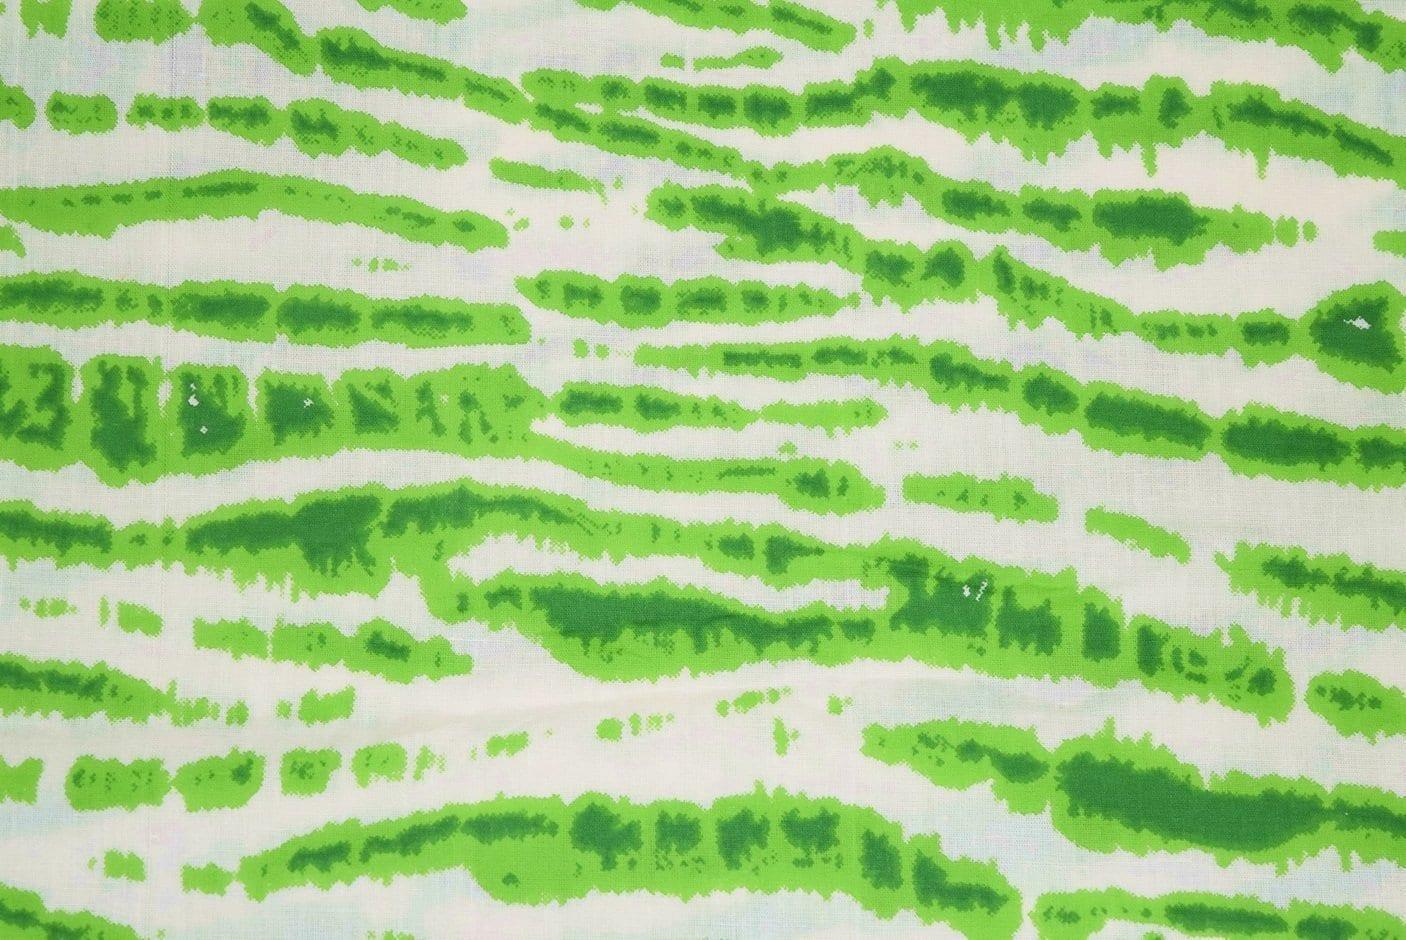 100% PURE Soft COTTON PRINTED fabric PC256 1